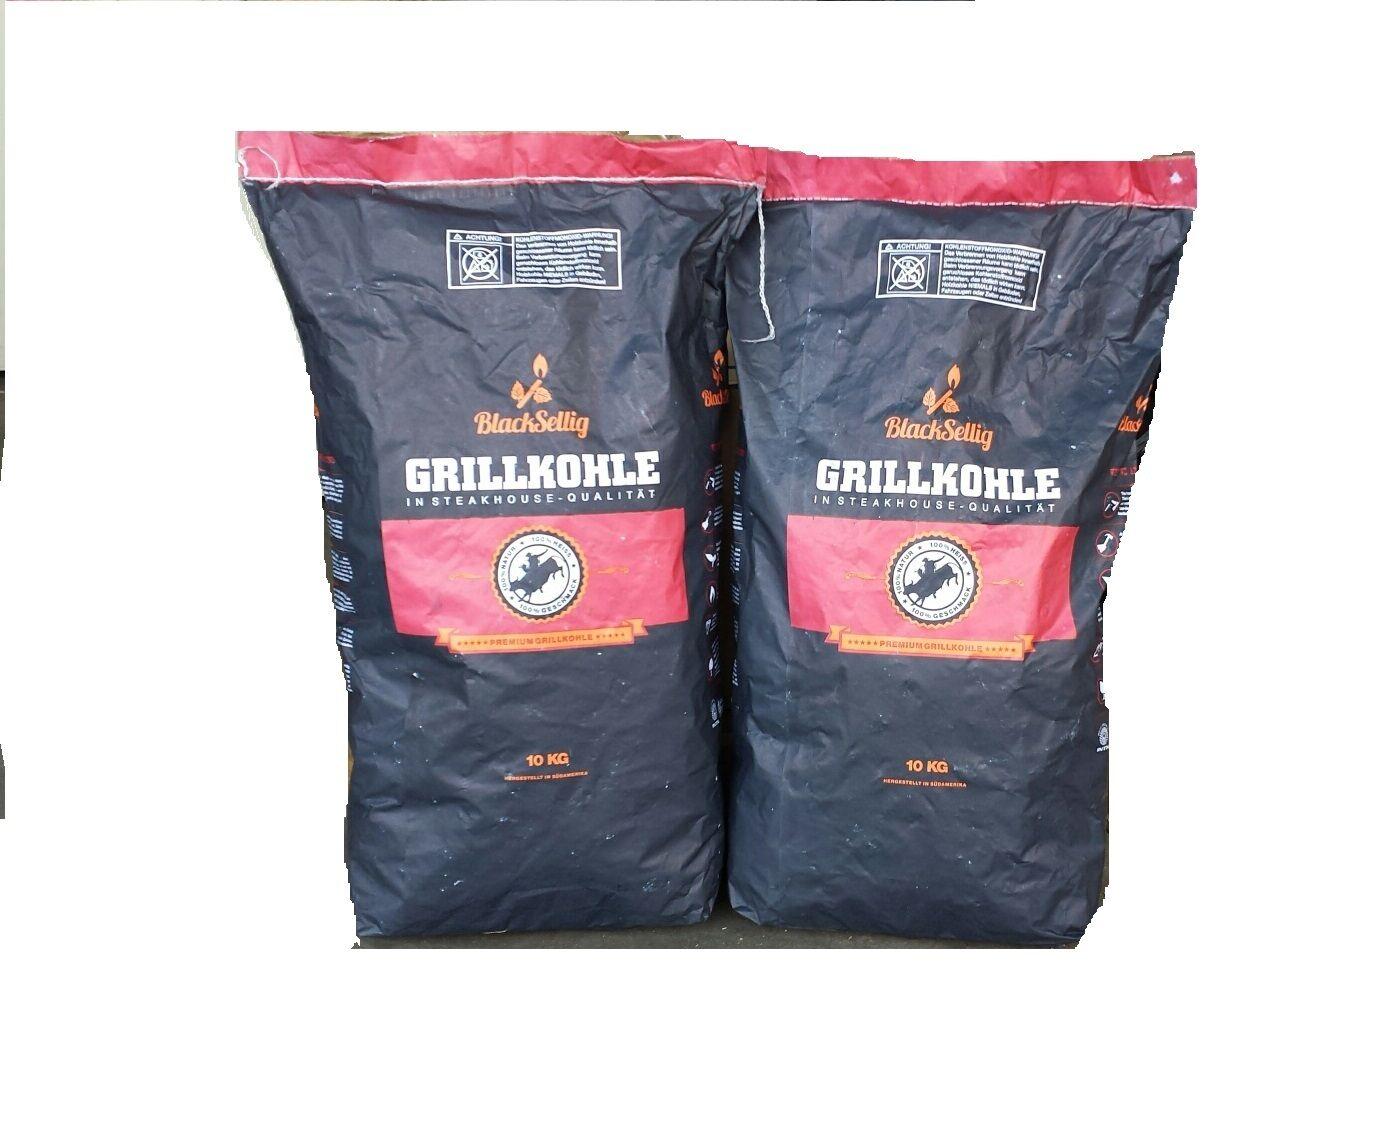 (1,75€/kg) 20 Kg Steakhousekohle Holzkohle Grillkohle von BlackSellig Premium